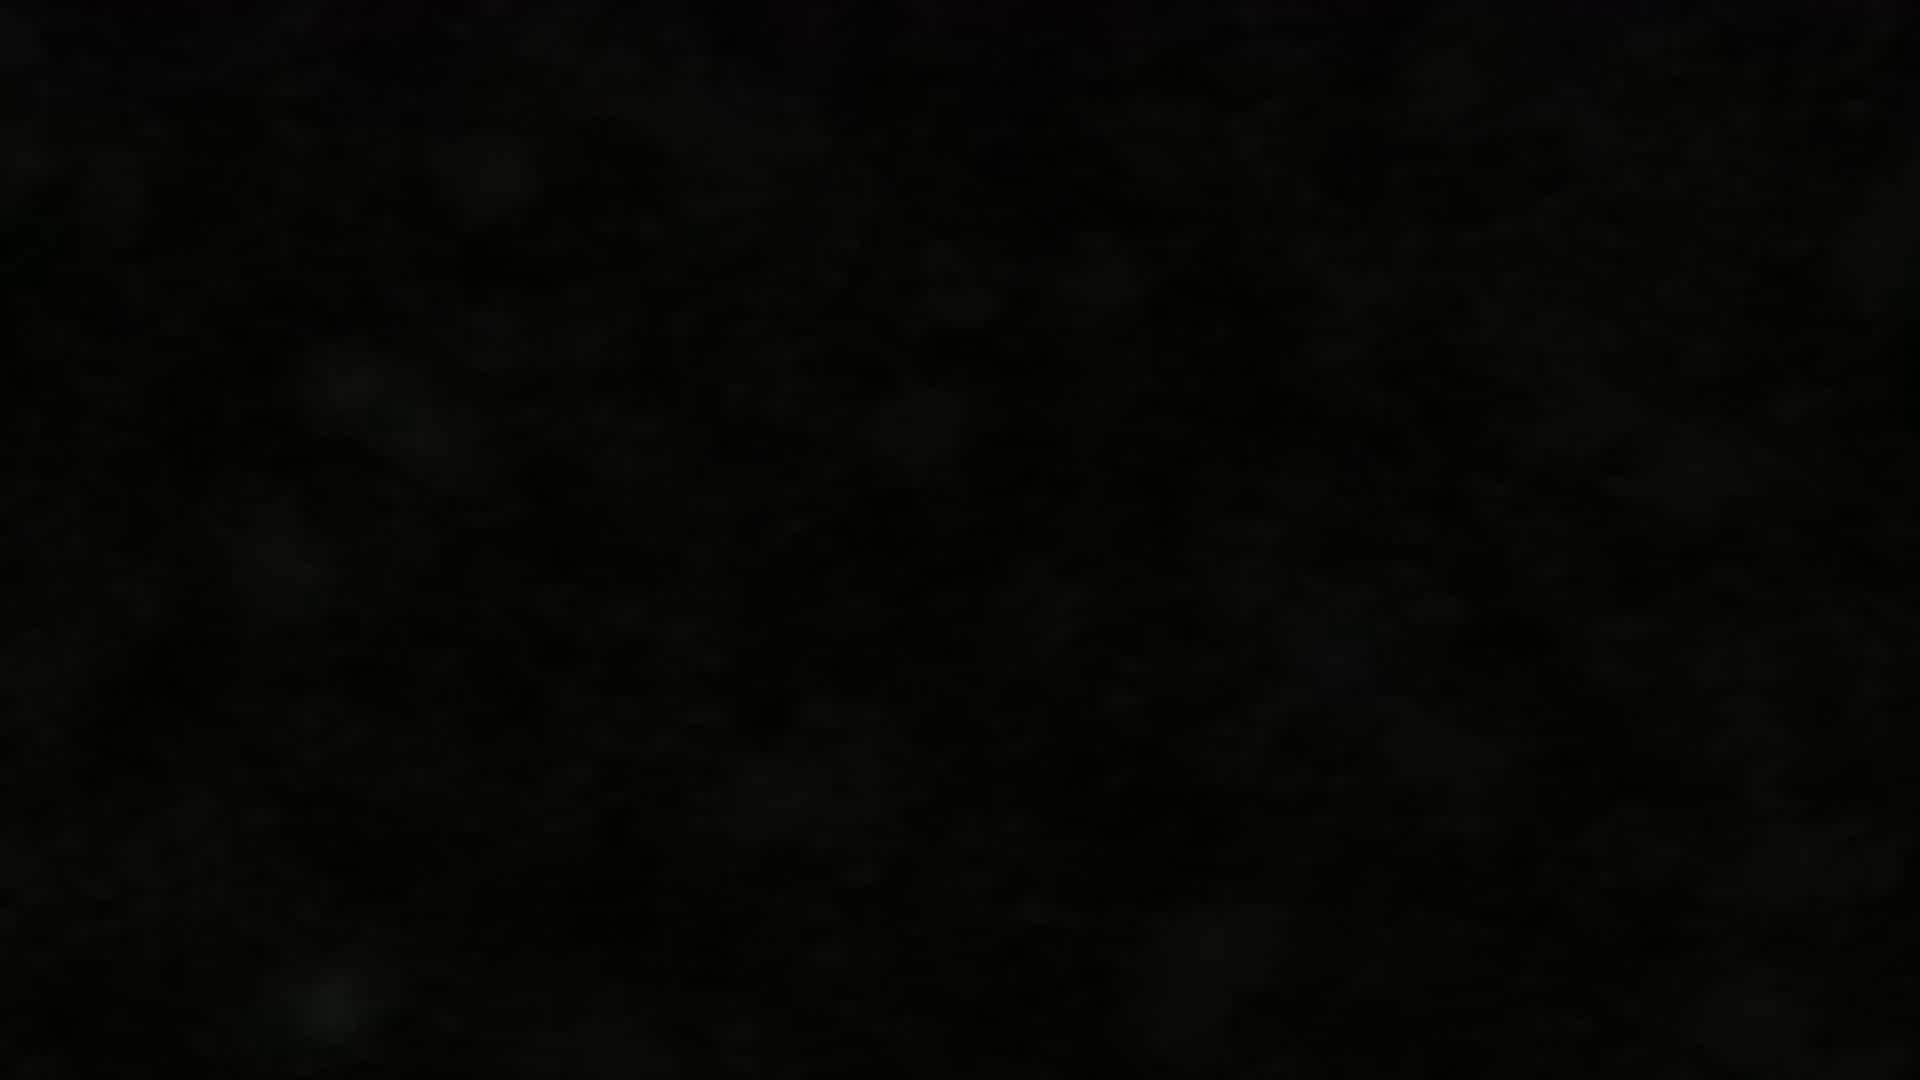 SPYさん初投稿!マンション覗き!5000K!ハイビジョン撮影VOL.05(元サッカー部員社会人) ノンケのオナニー ゲイエロ動画 75連発 36